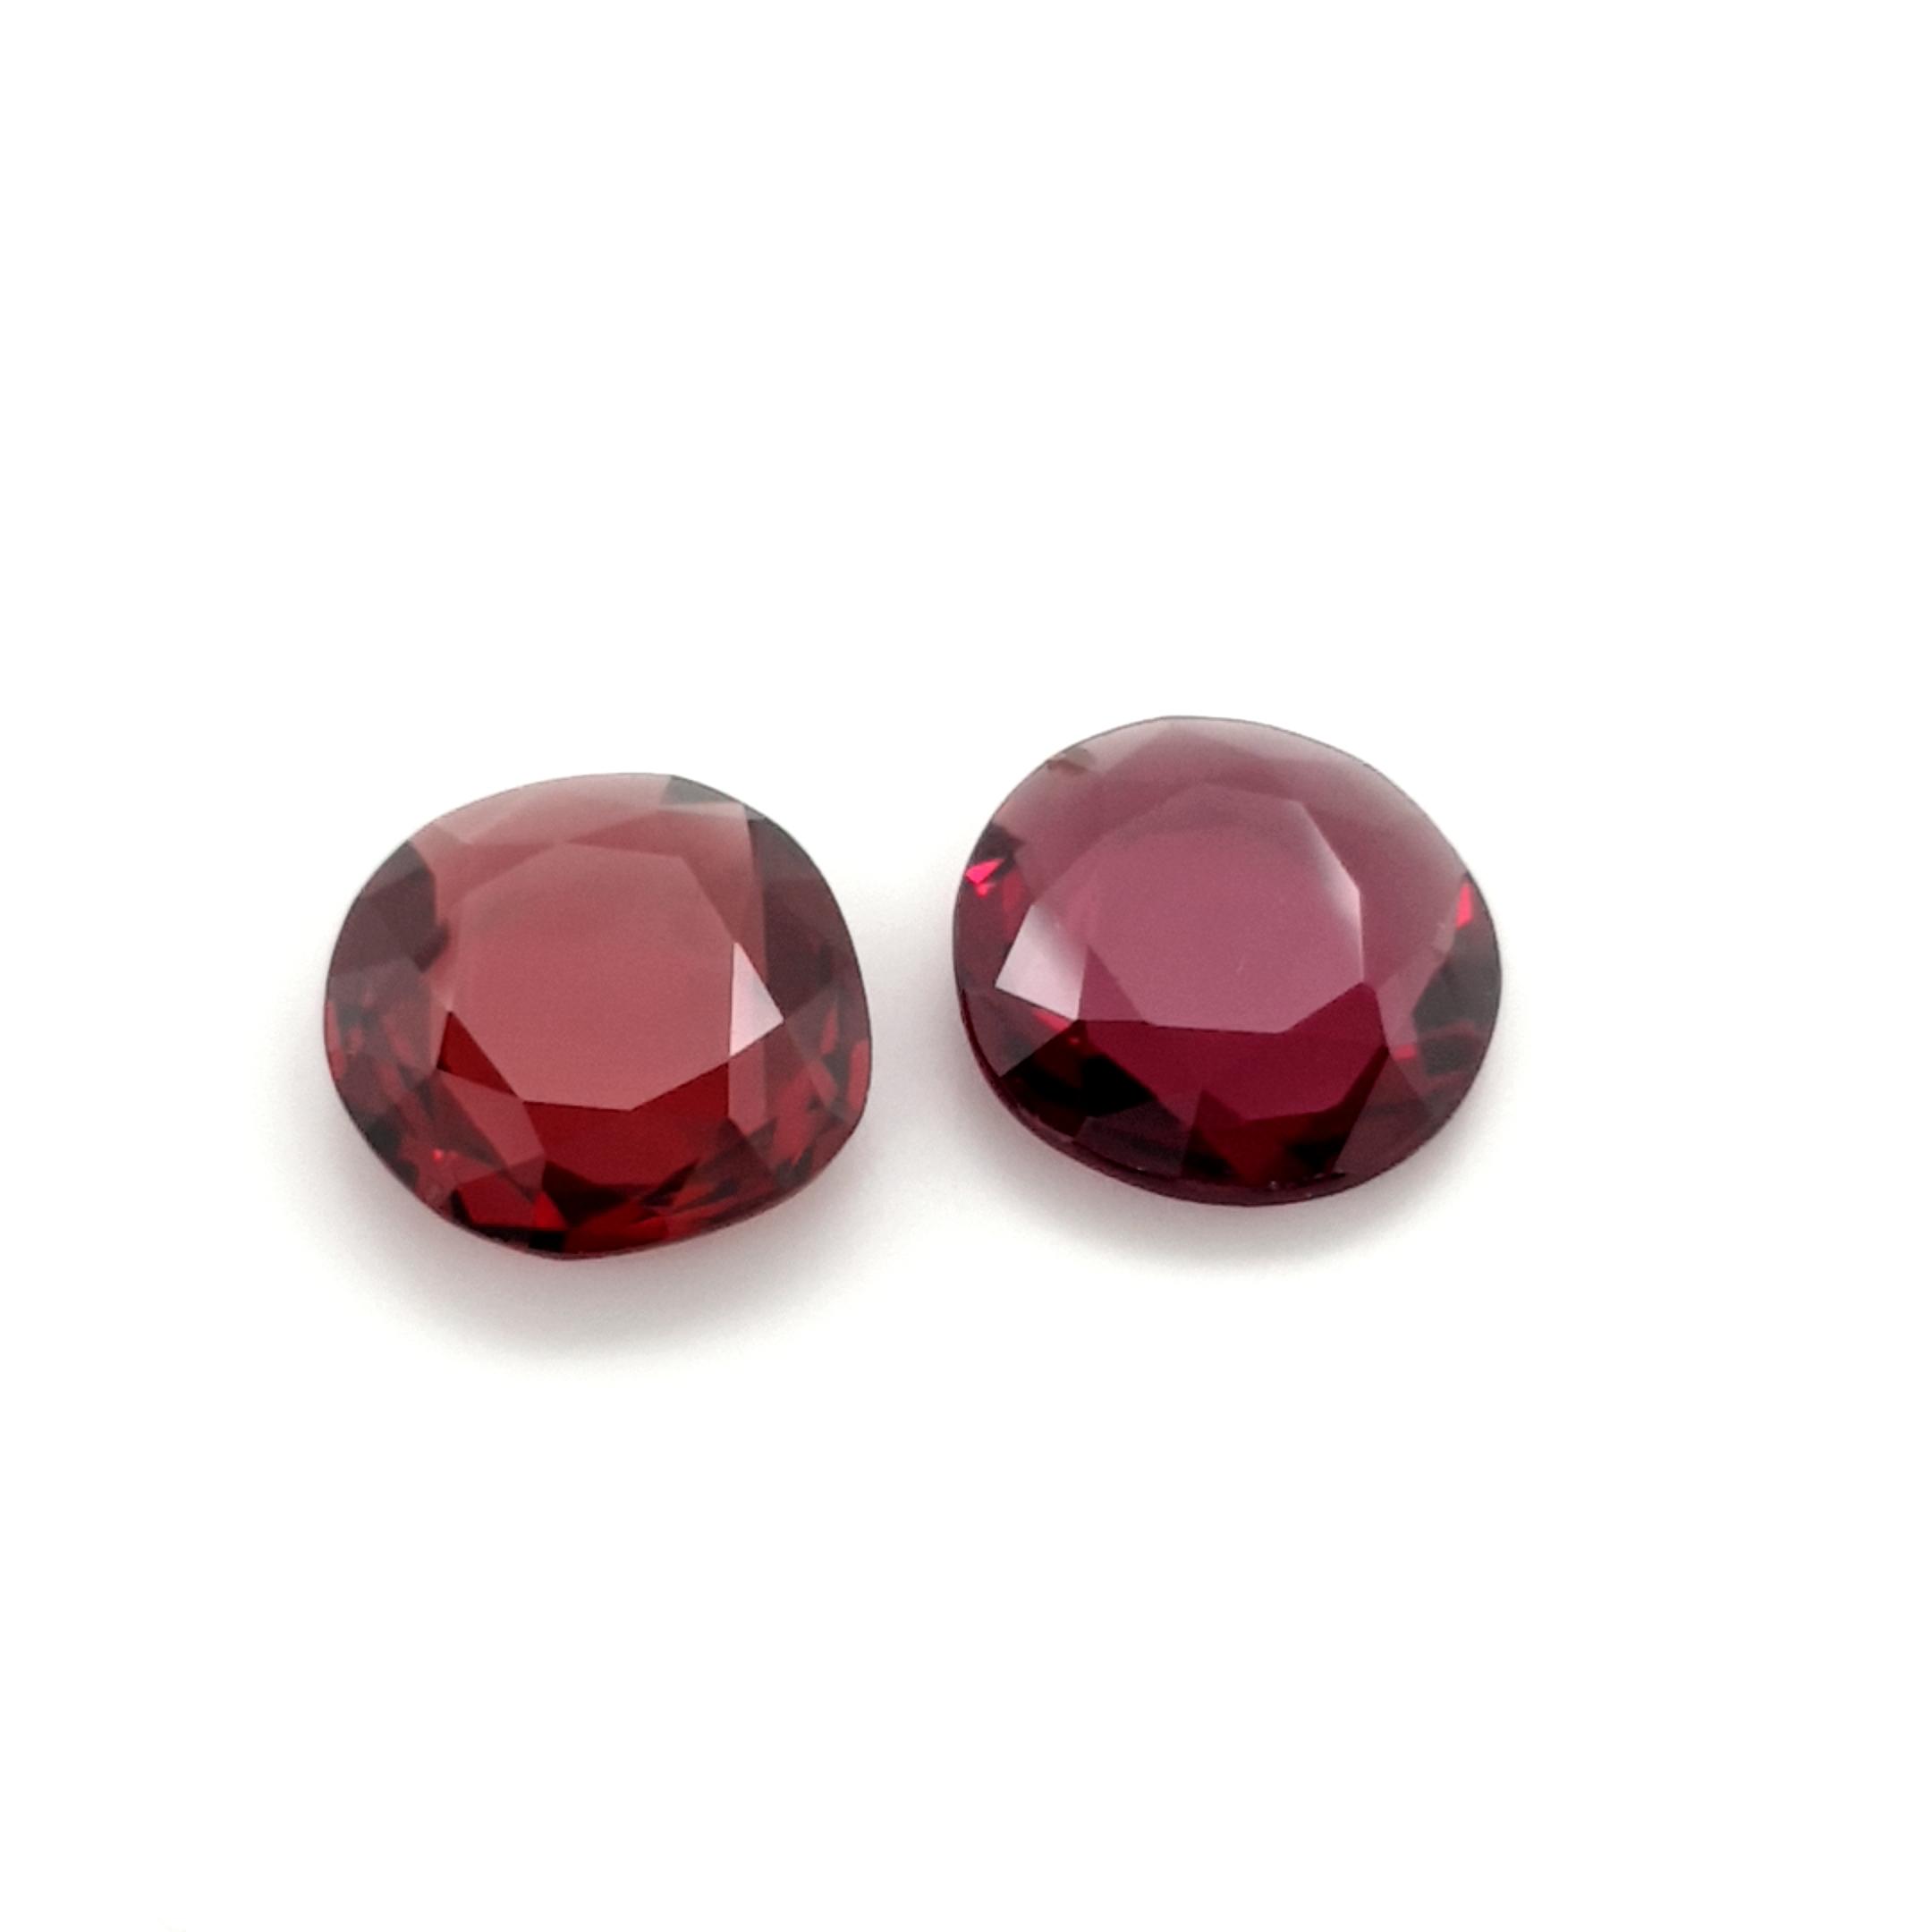 8,78ct. Pair 11x12mm Rhodolite Garnet DoubleRoseCut GRD19C1 ClaudiaHamann__2021-02-28-18-26-20